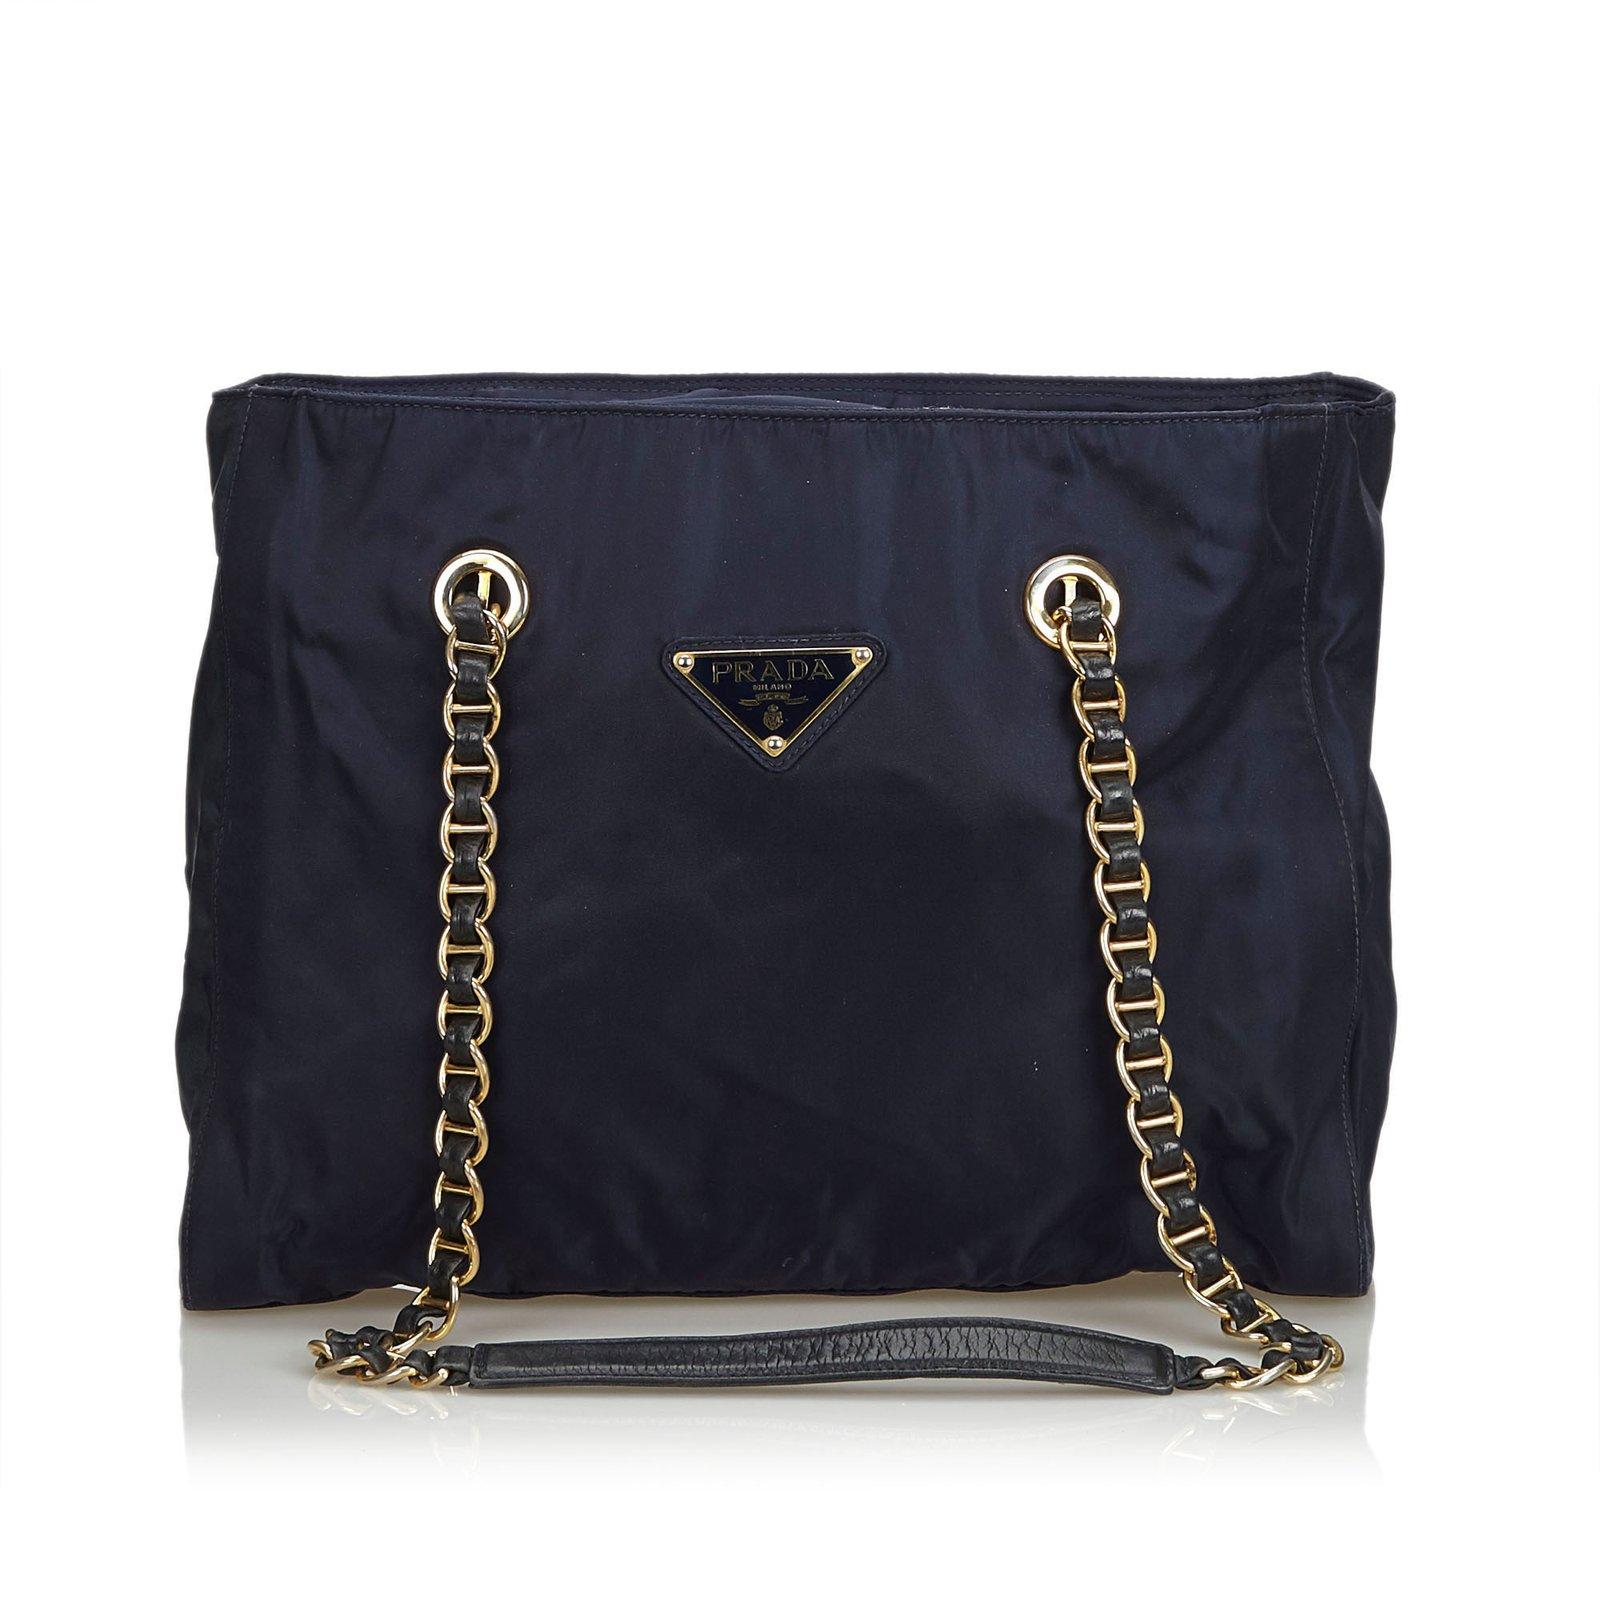 23e5f11a463b78 Prada Nylon Chain Tote Bag Totes Leather,Other,Nylon,Cloth Blue,Navy ...